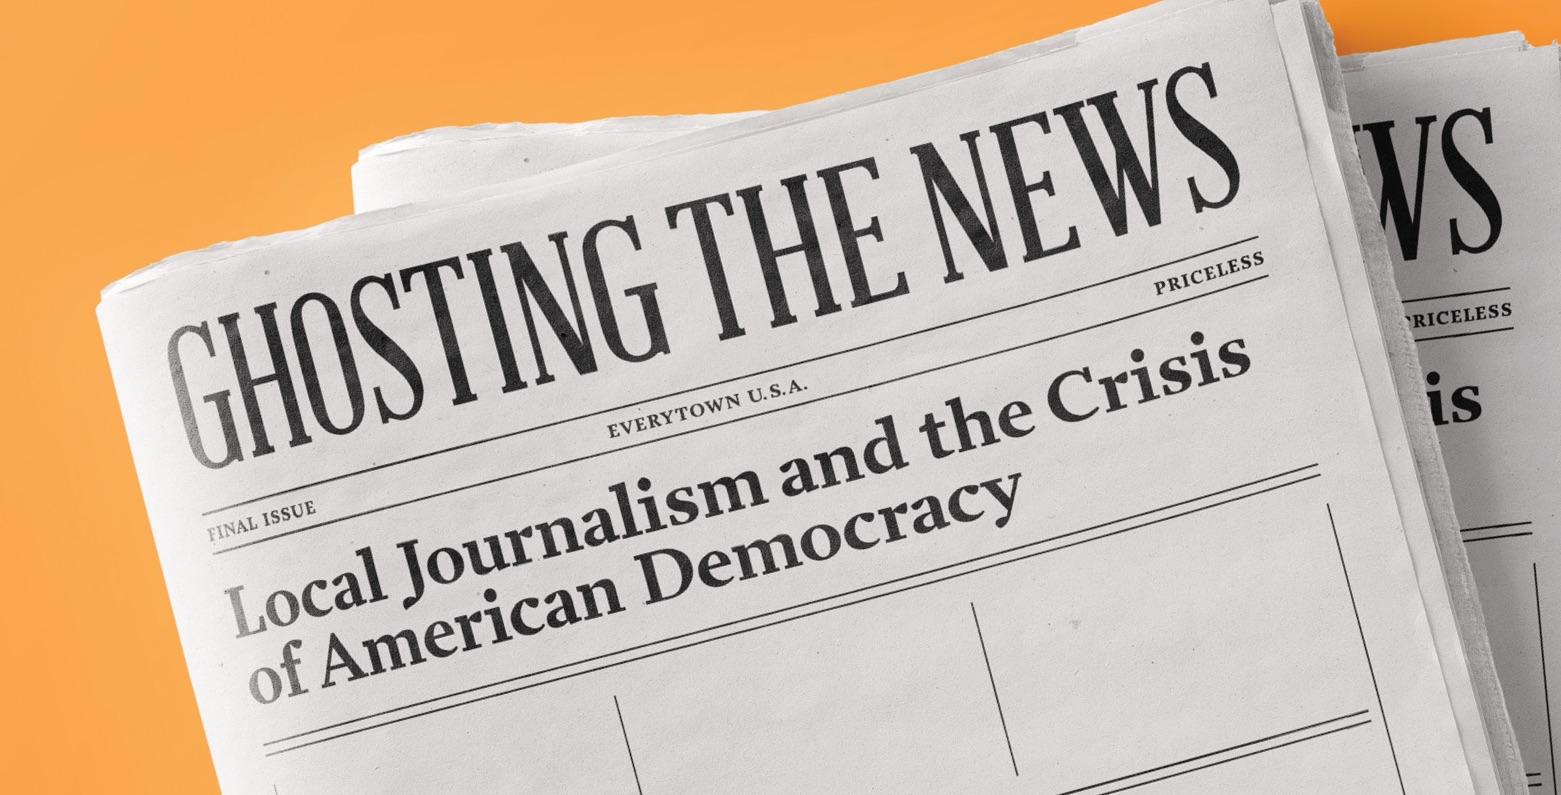 Washington Post's Margaret Sullivan on 'Ghosting the News'